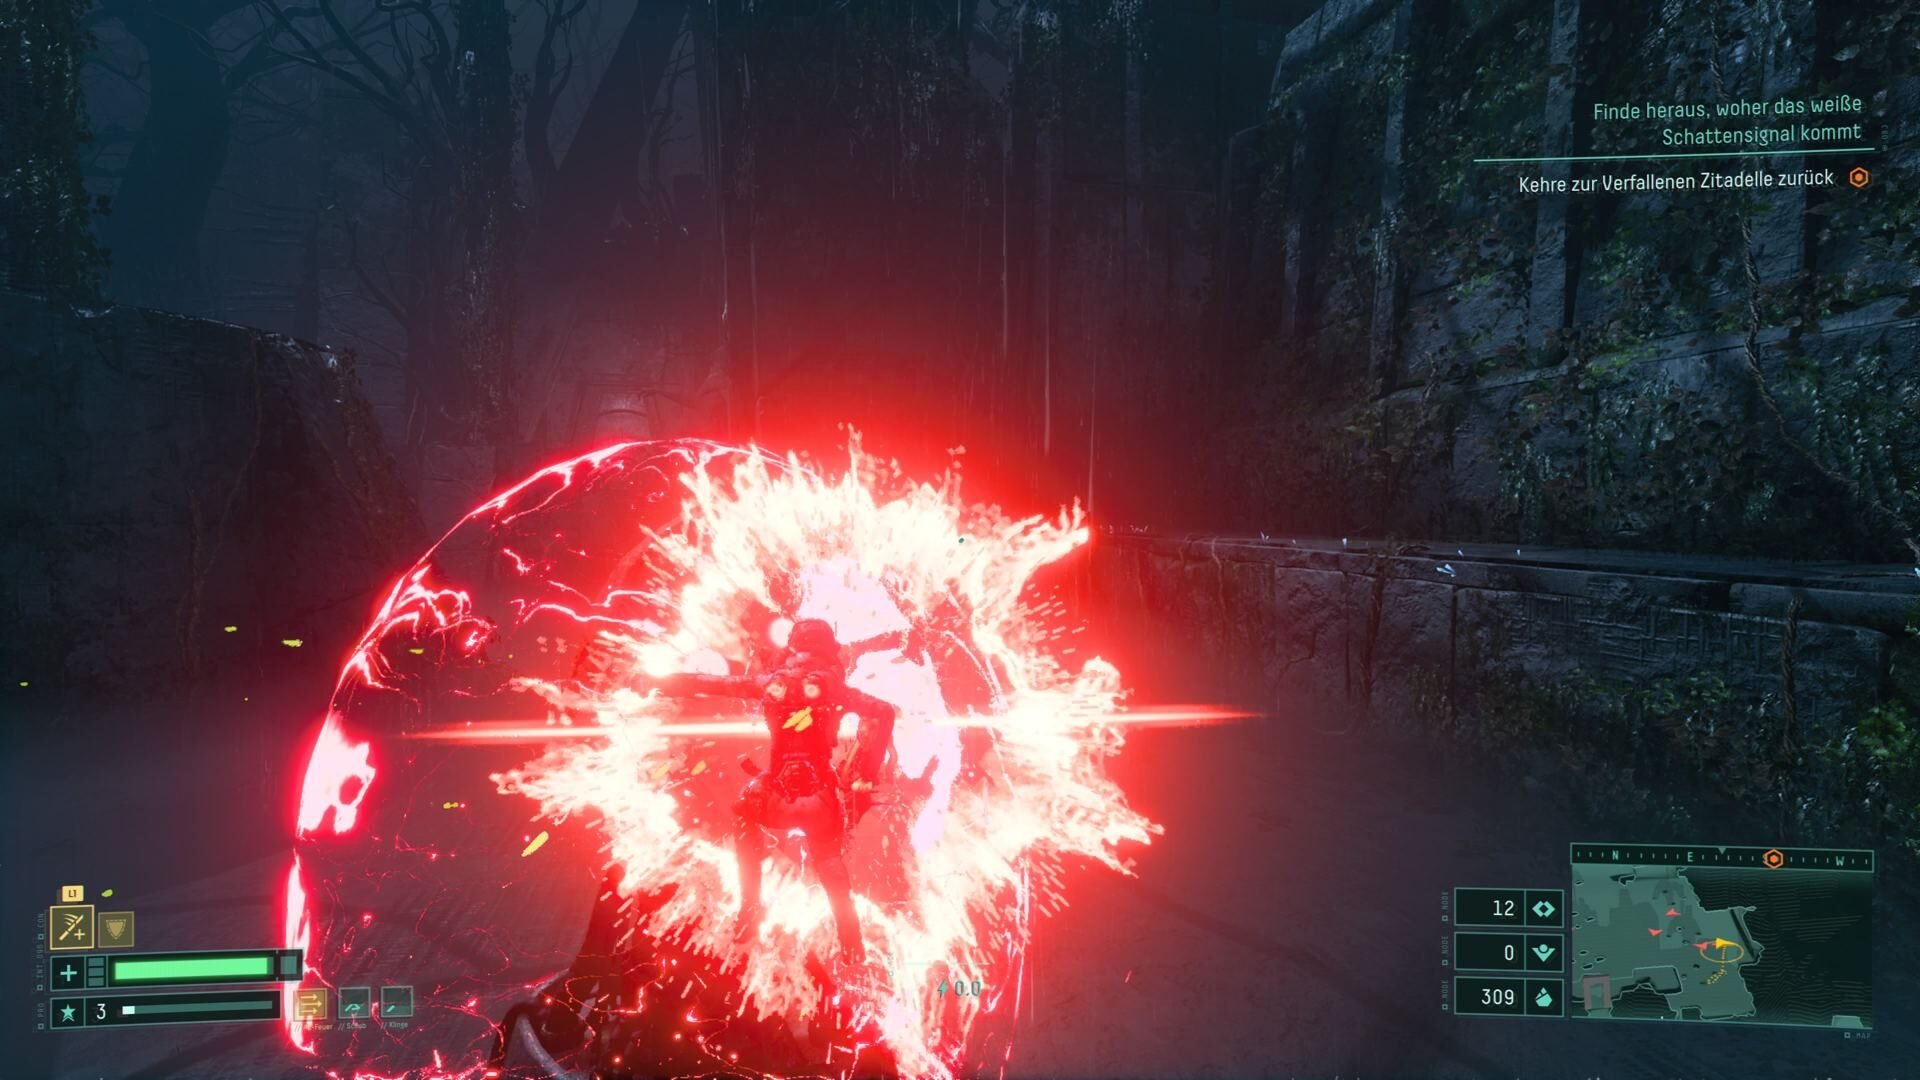 Selene uses the Atropian Blade in the PS5 game Returnal.